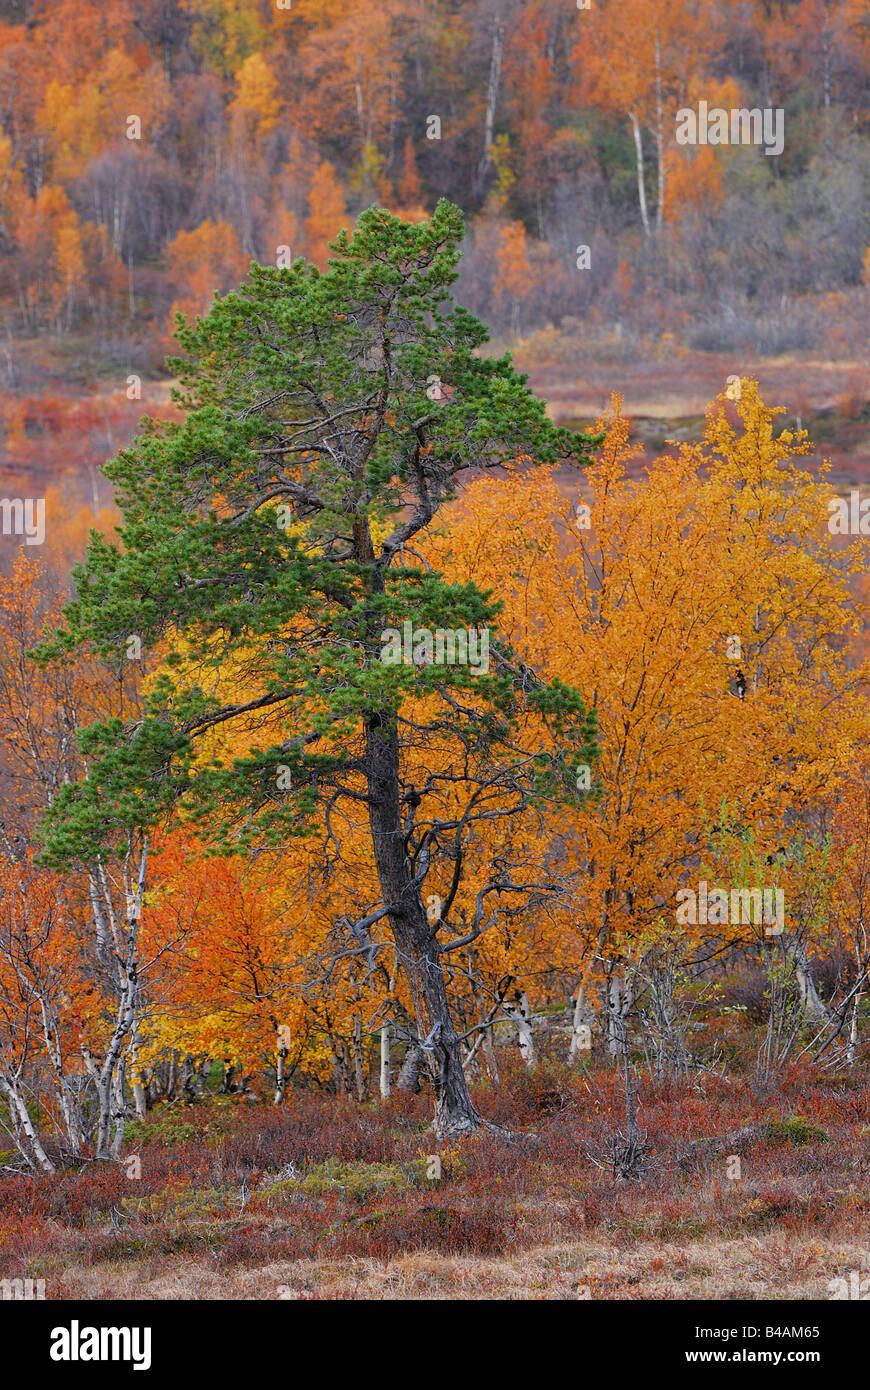 autumn trees in lapland sweden - Stock Image